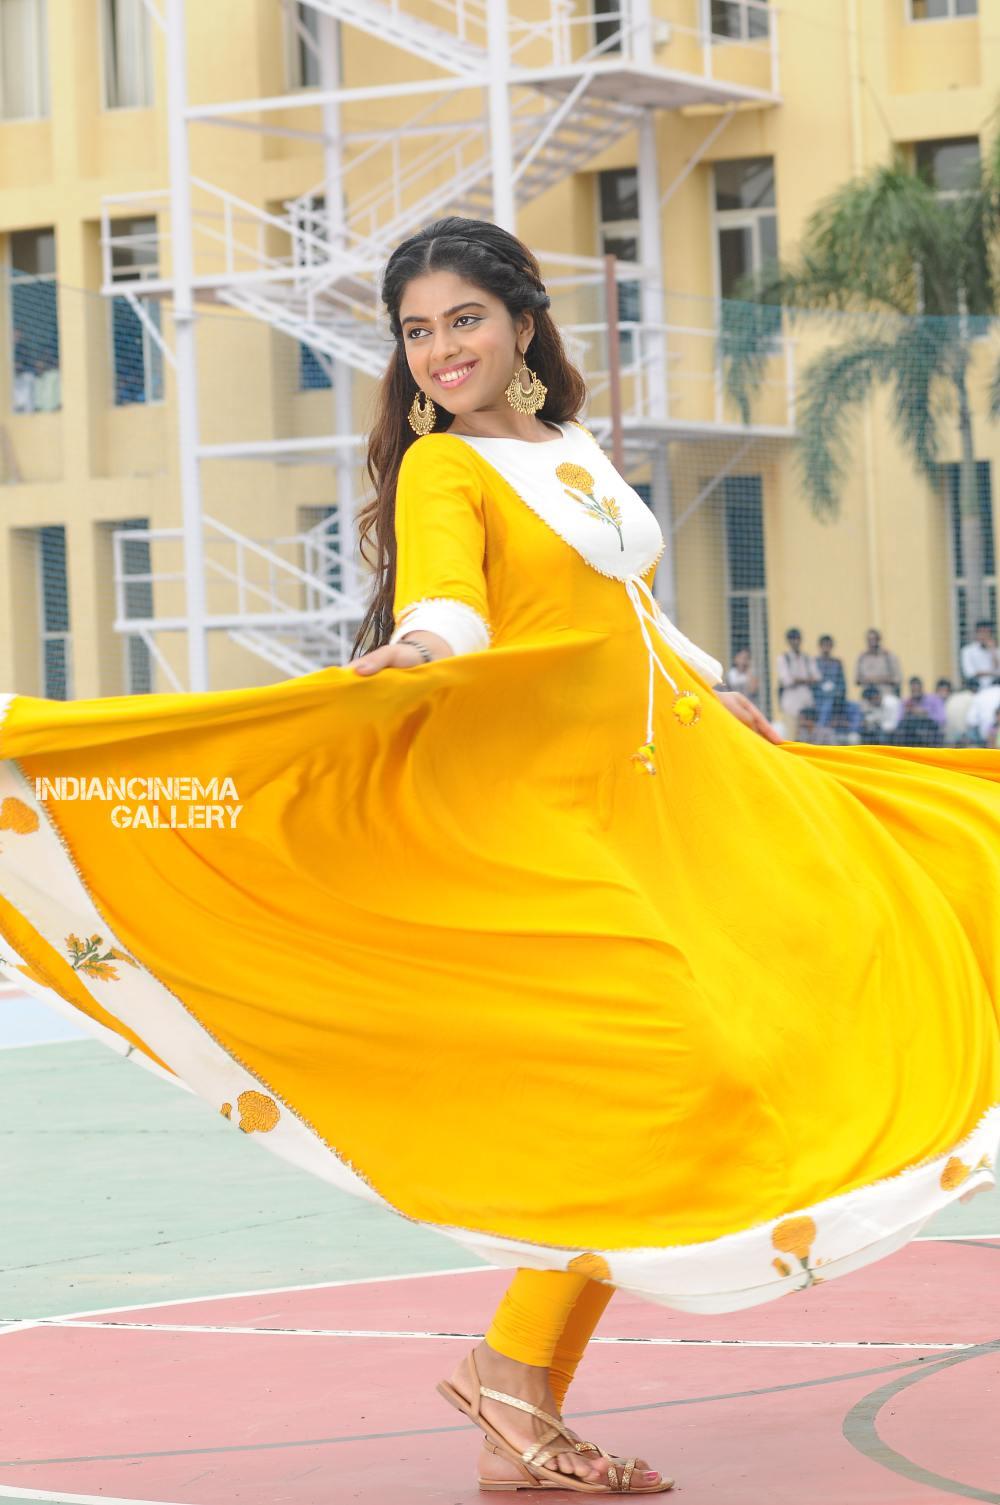 siddhi idnani in Prema Katha Chitram 2 Movie (7)